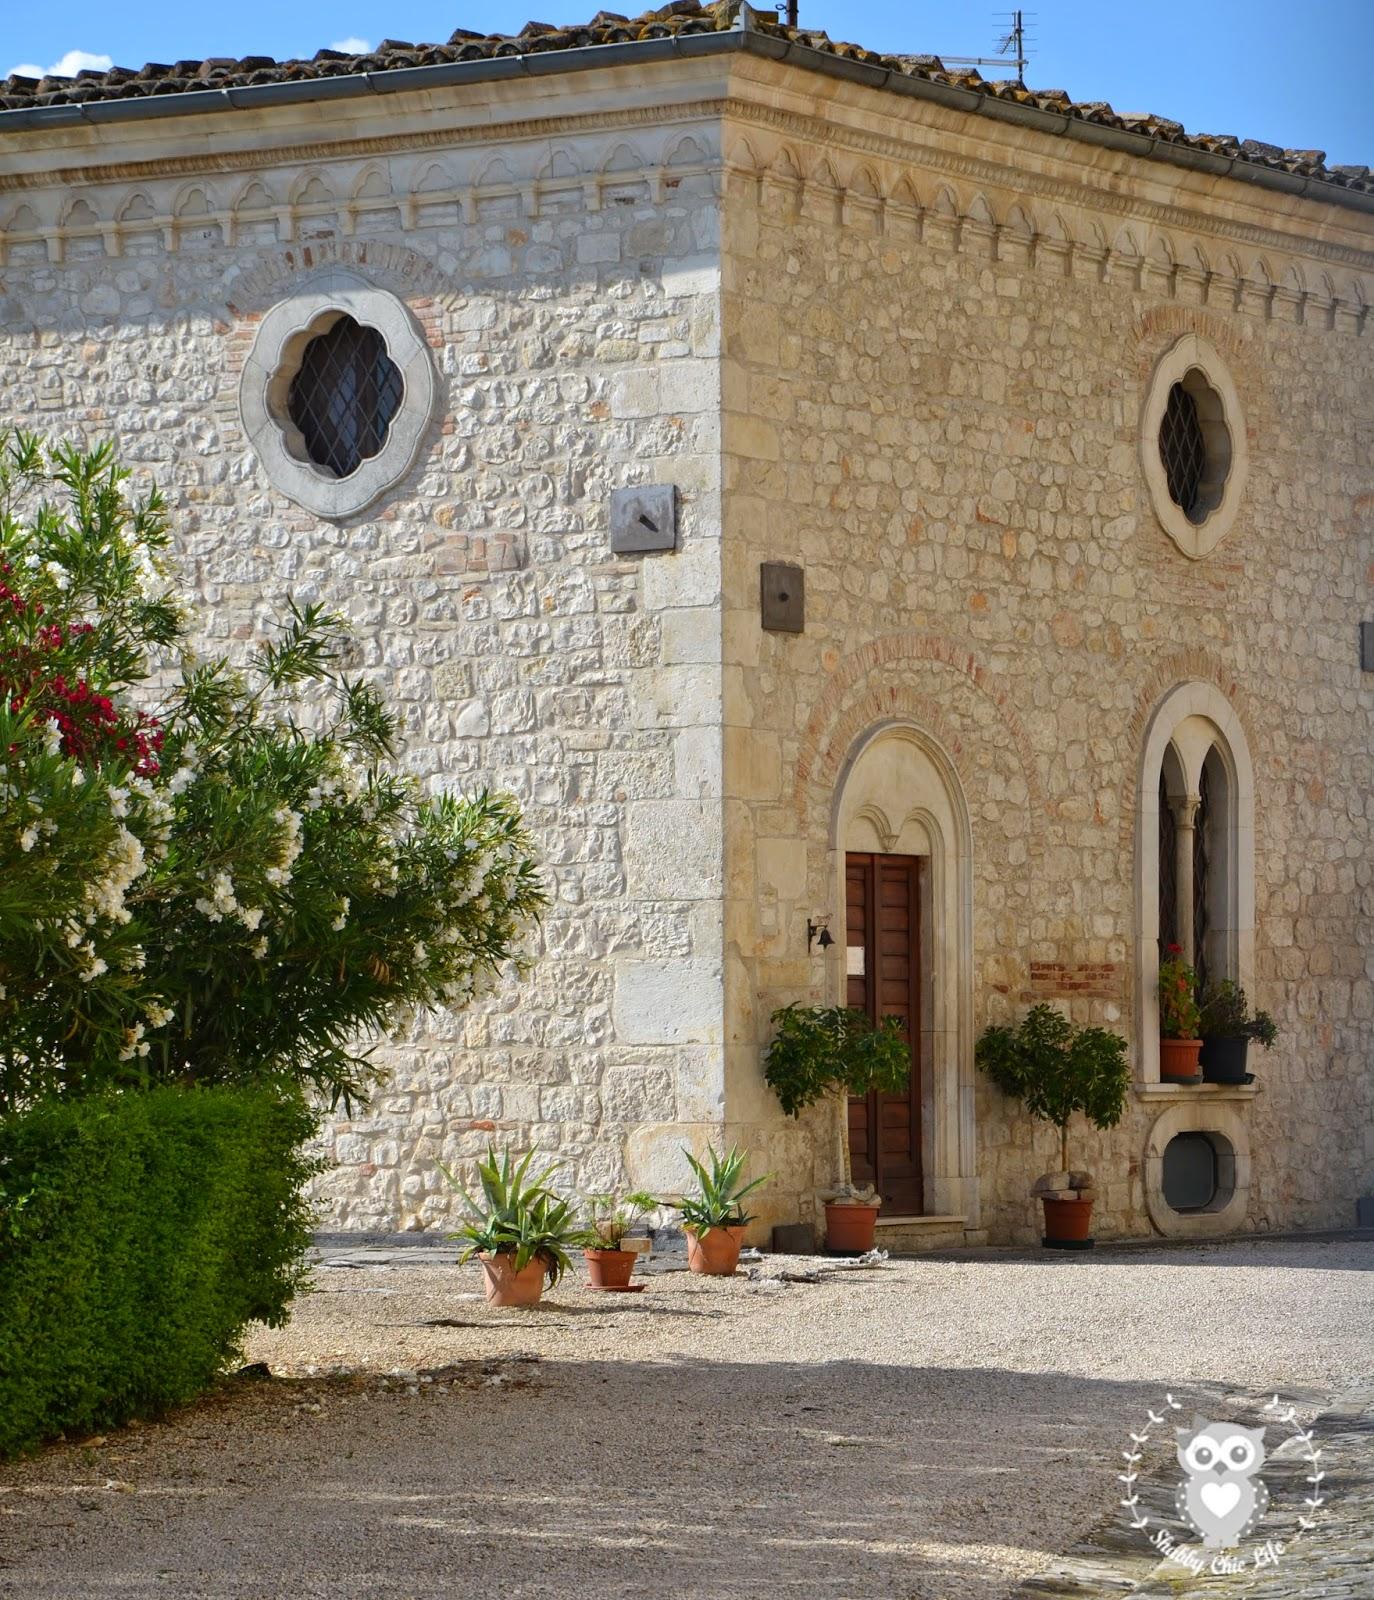 Abbazia Santa Maria Arabona, Manoppello